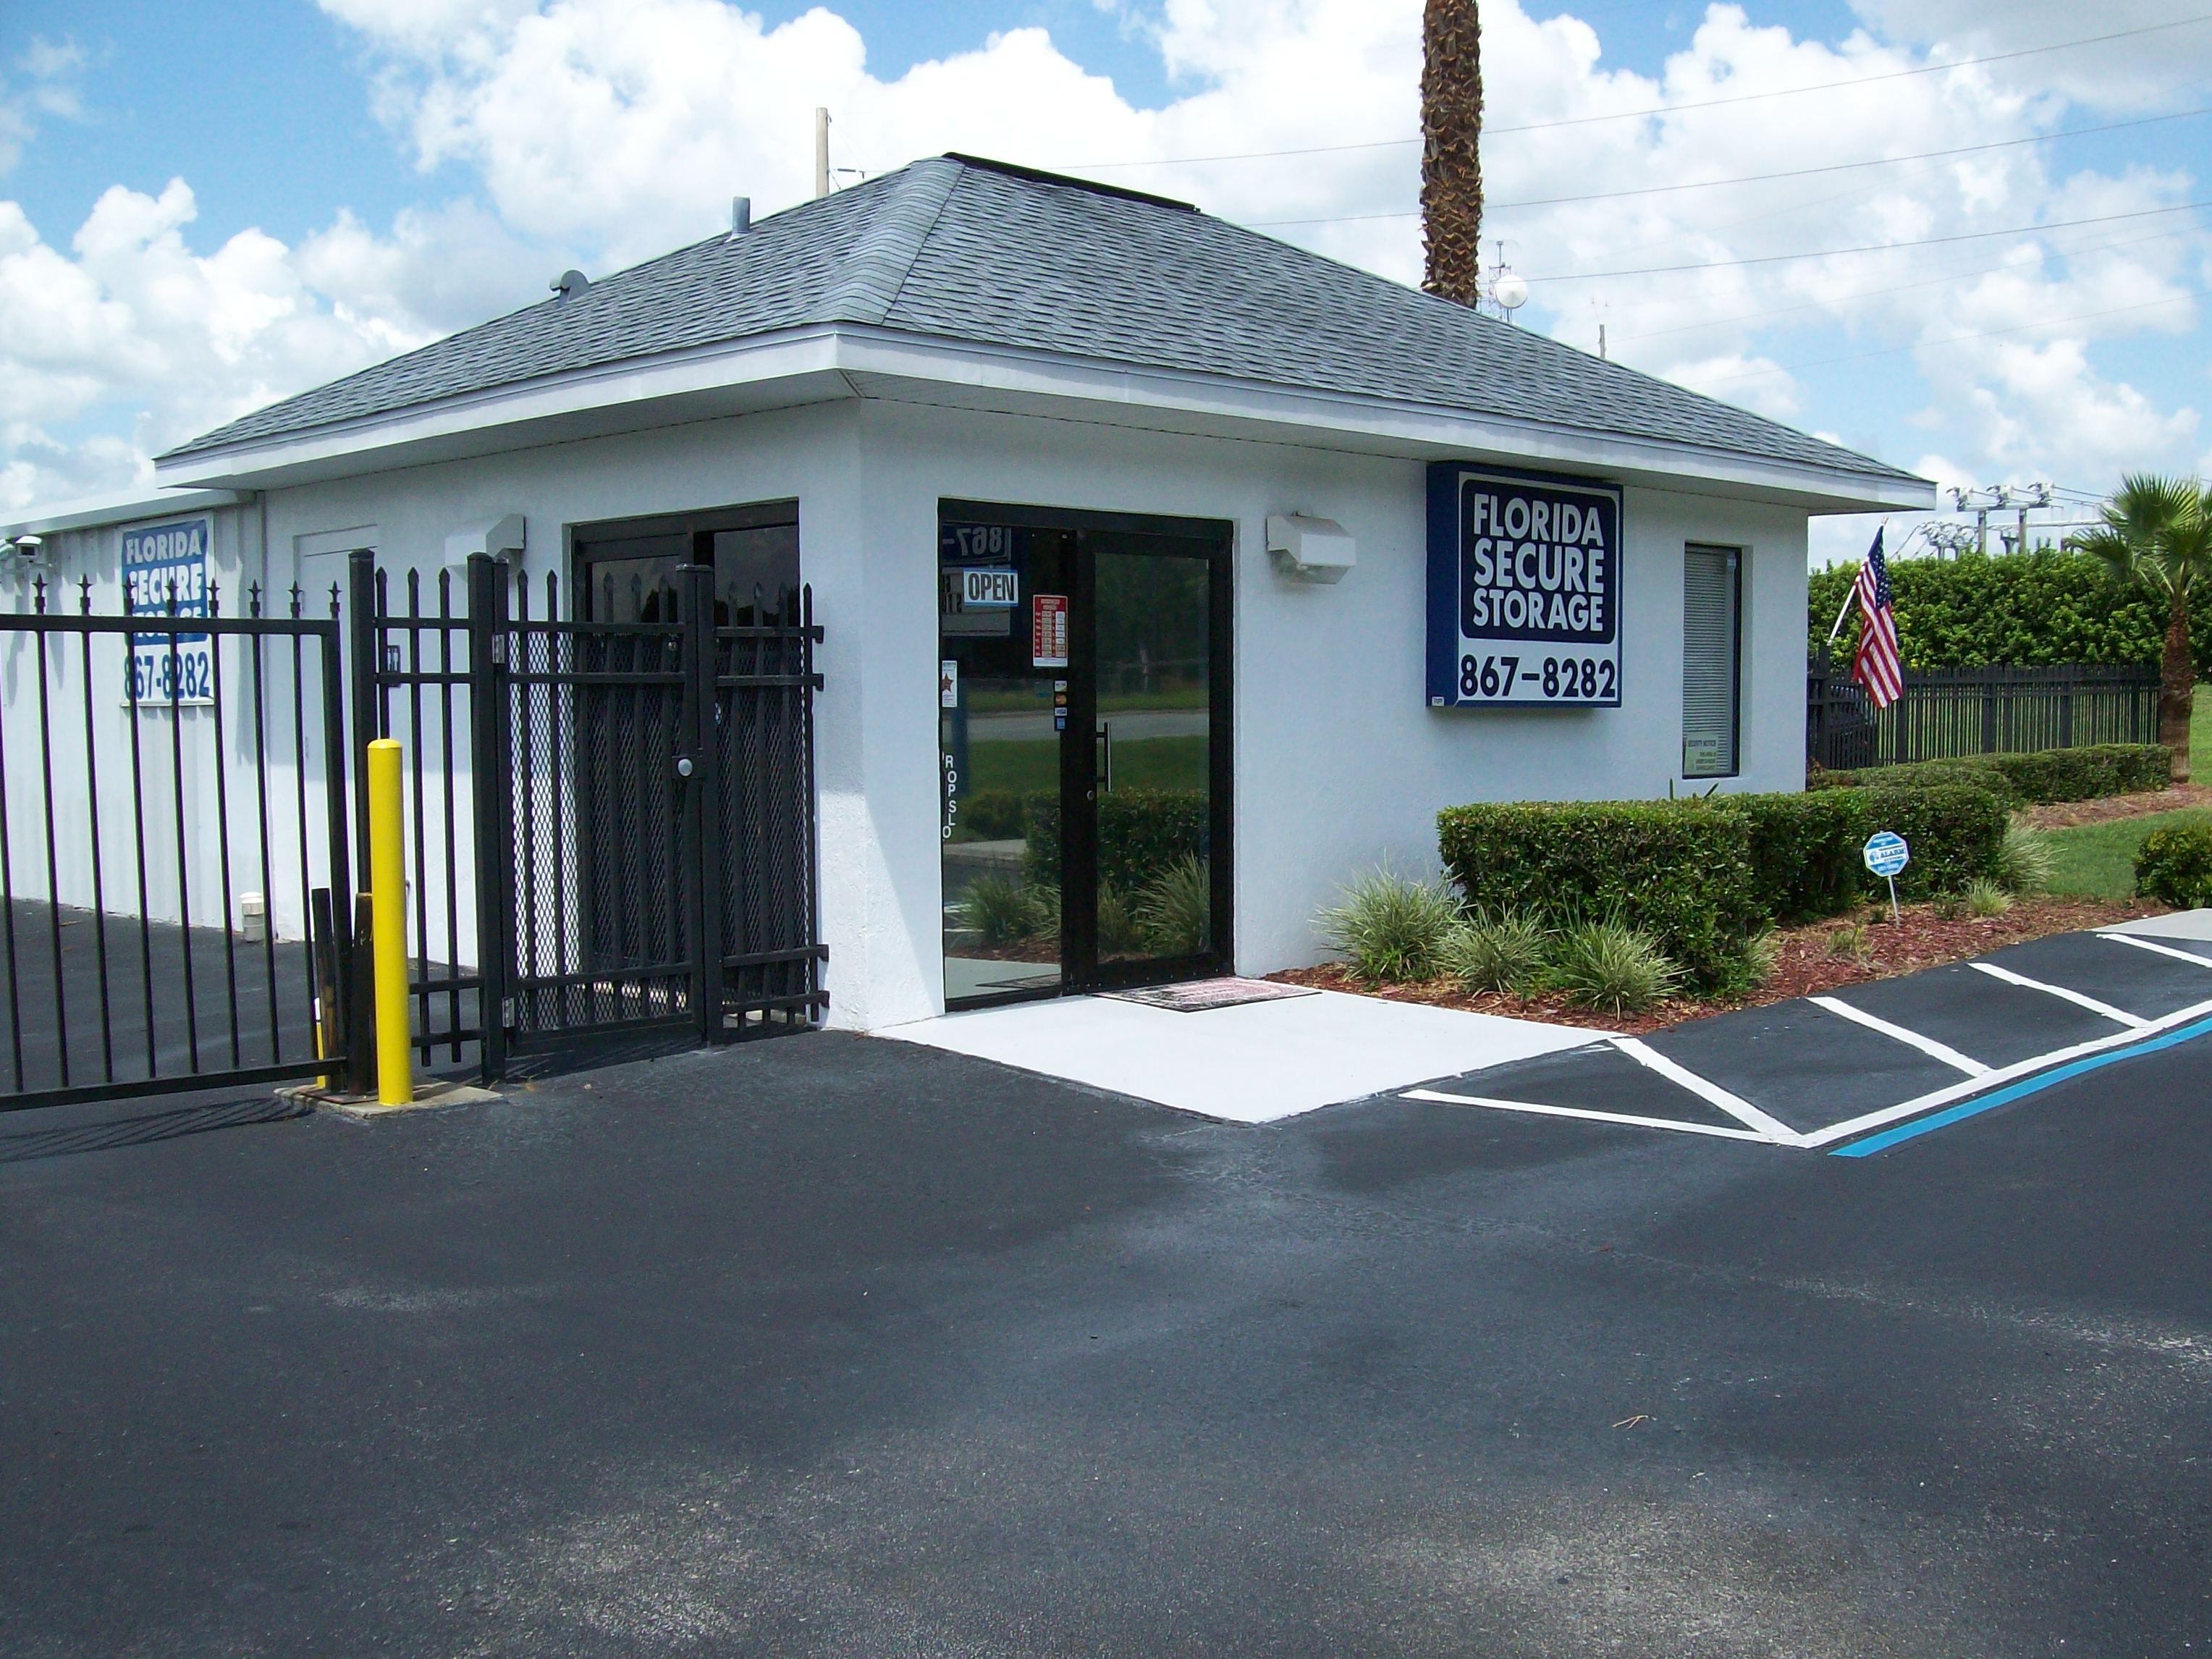 Florida Secure Storage 5030 SW 60th Ave Ocala FL Warehouses Merchandise u0026 Self Storage - MapQuest & Florida Secure Storage 5030 SW 60th Ave Ocala FL Warehouses ...